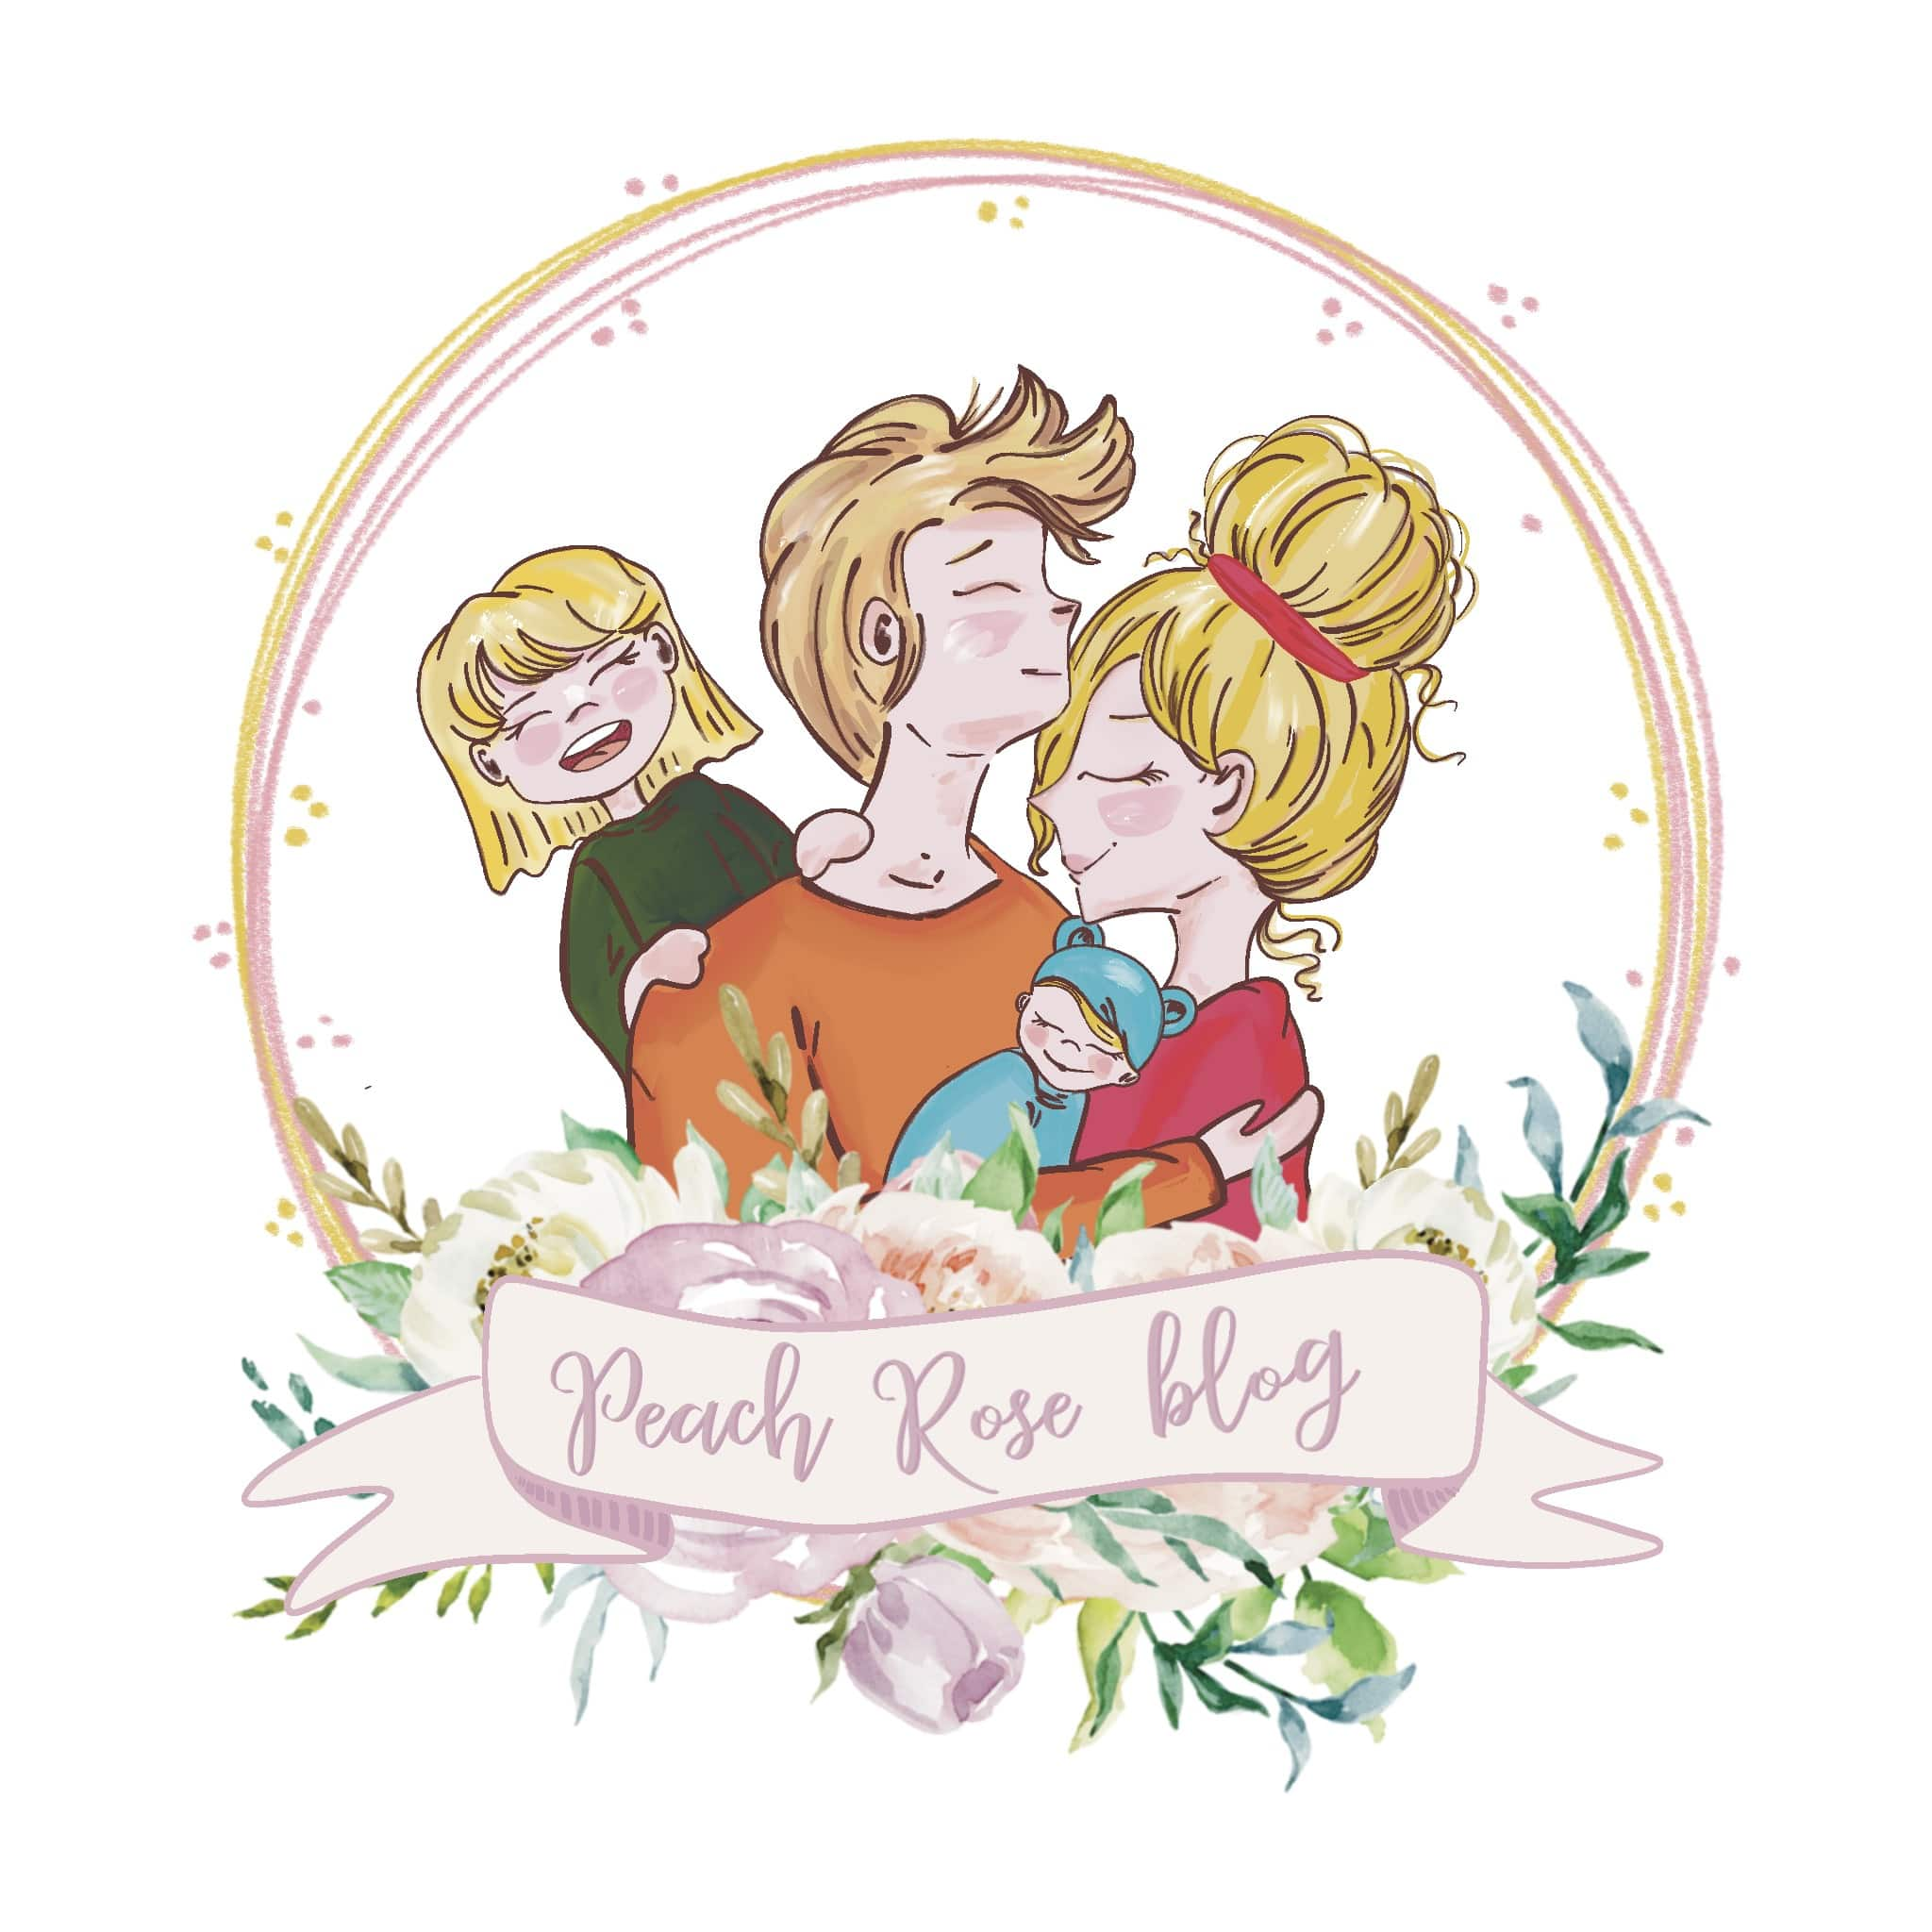 Peachroseblog